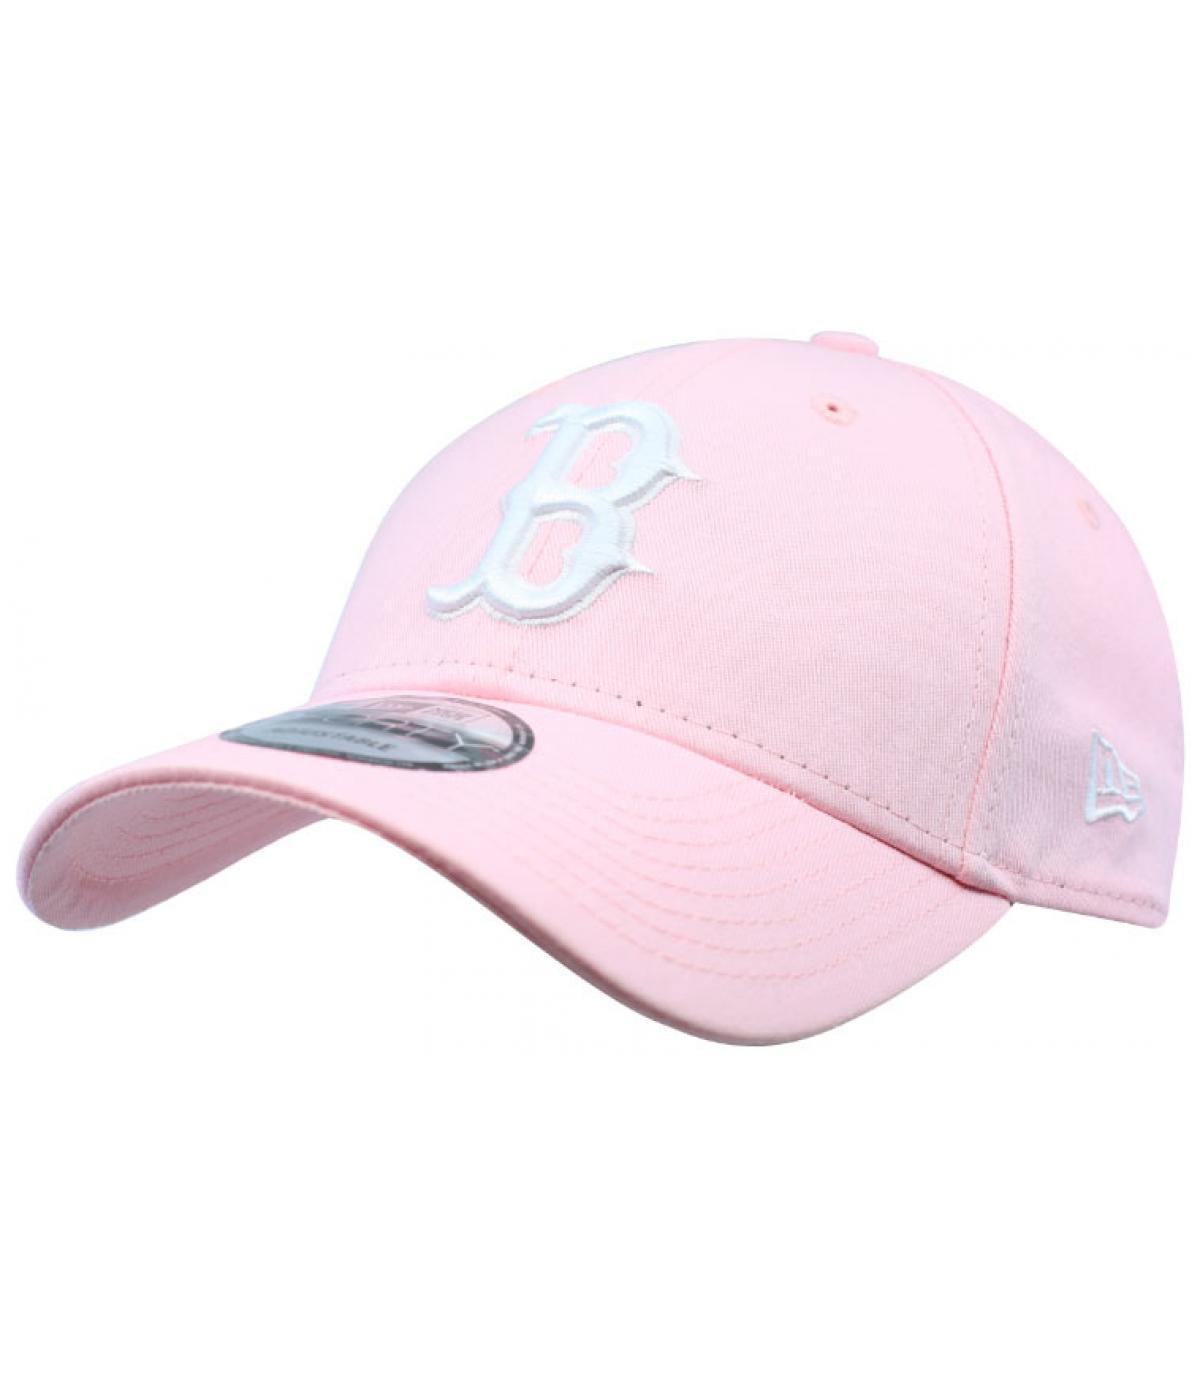 Details Cap League Ess Boston 9Forty pink - Abbildung 2